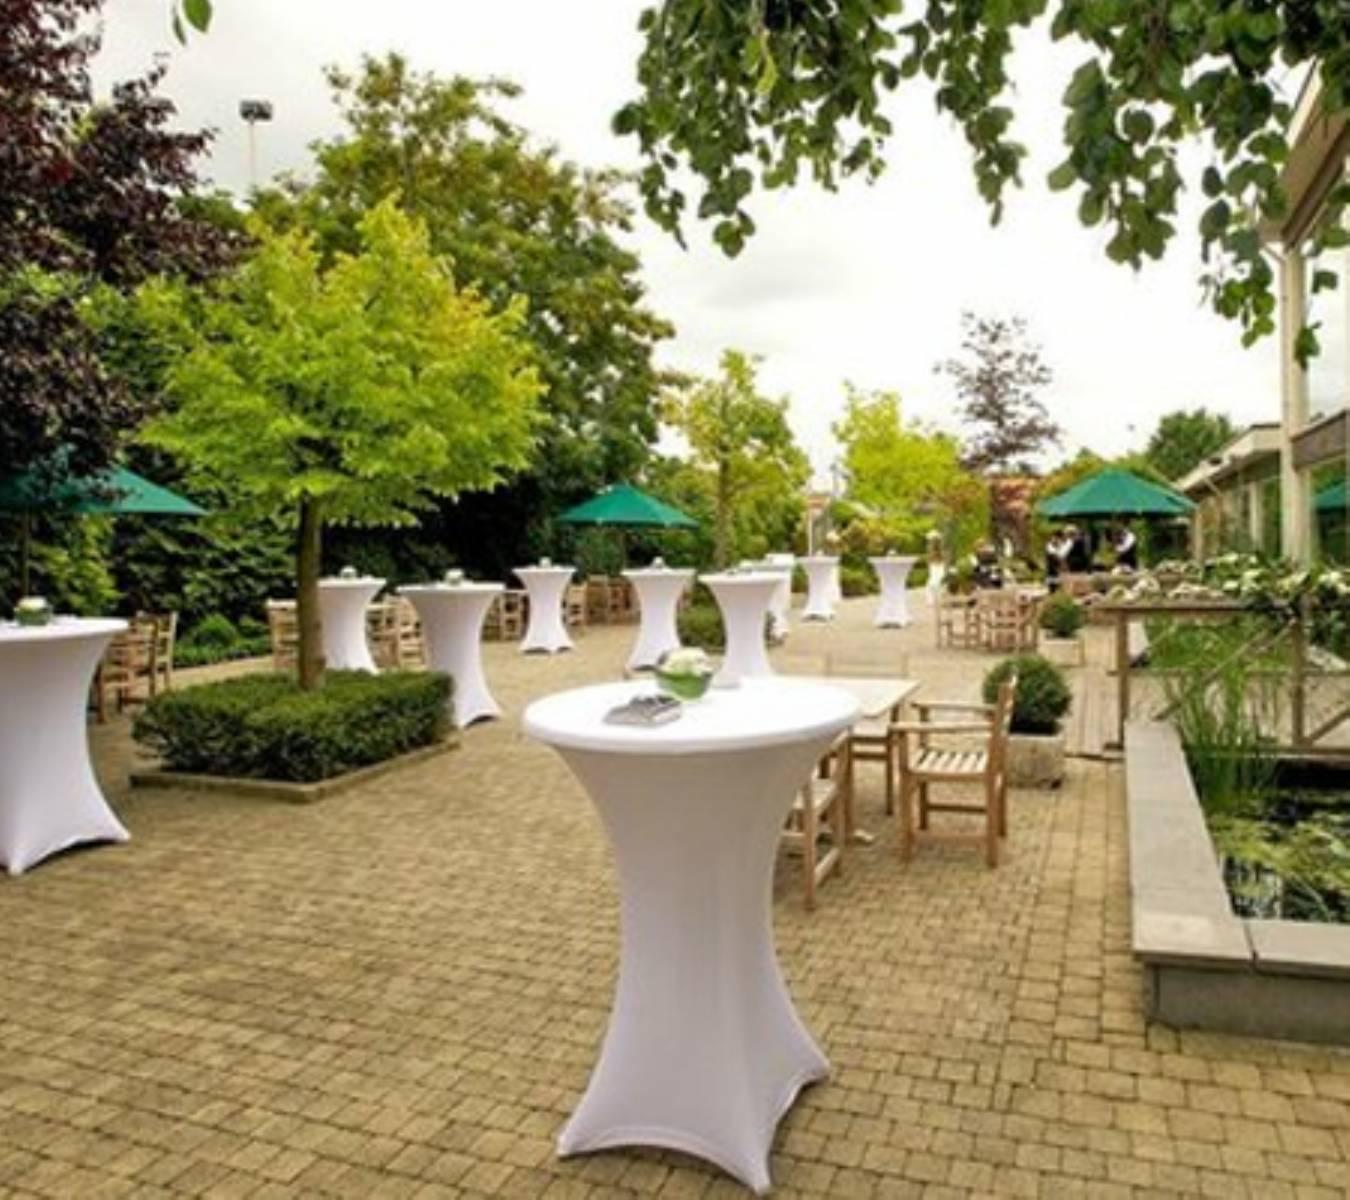 Cortina-Wevelgem-Feestzaal-House-of-Events-_3_